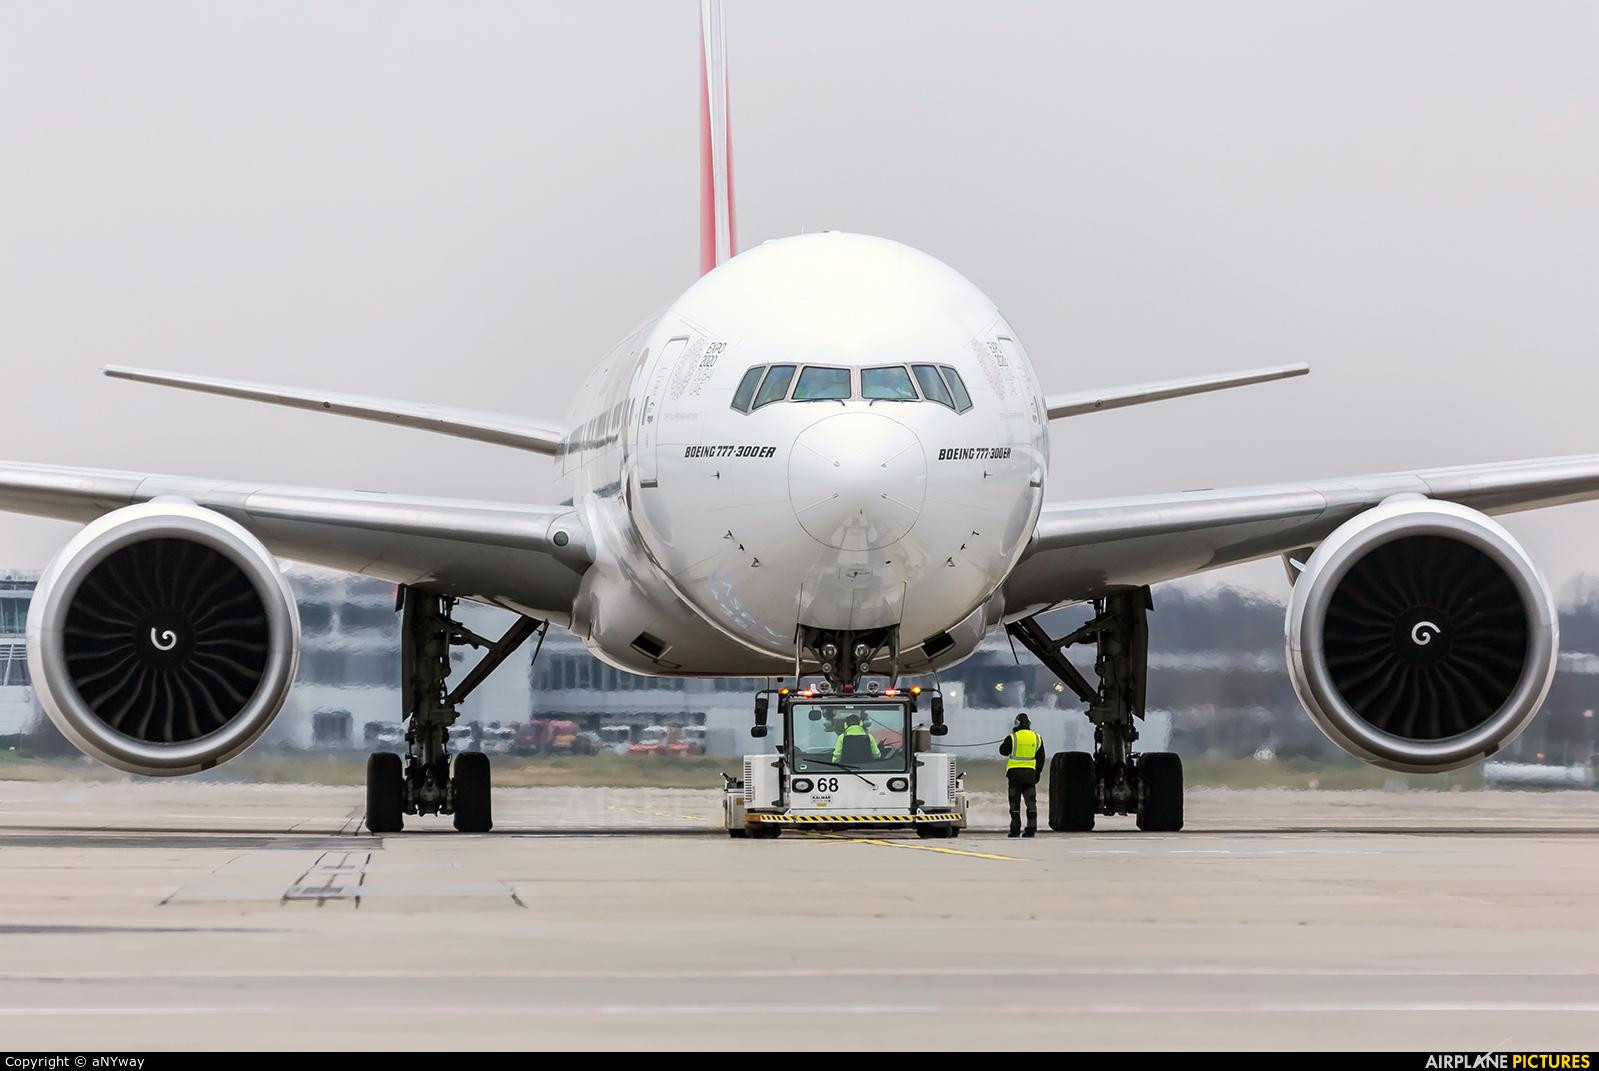 Emirates Airlines A6-EBY aircraft at Düsseldorf